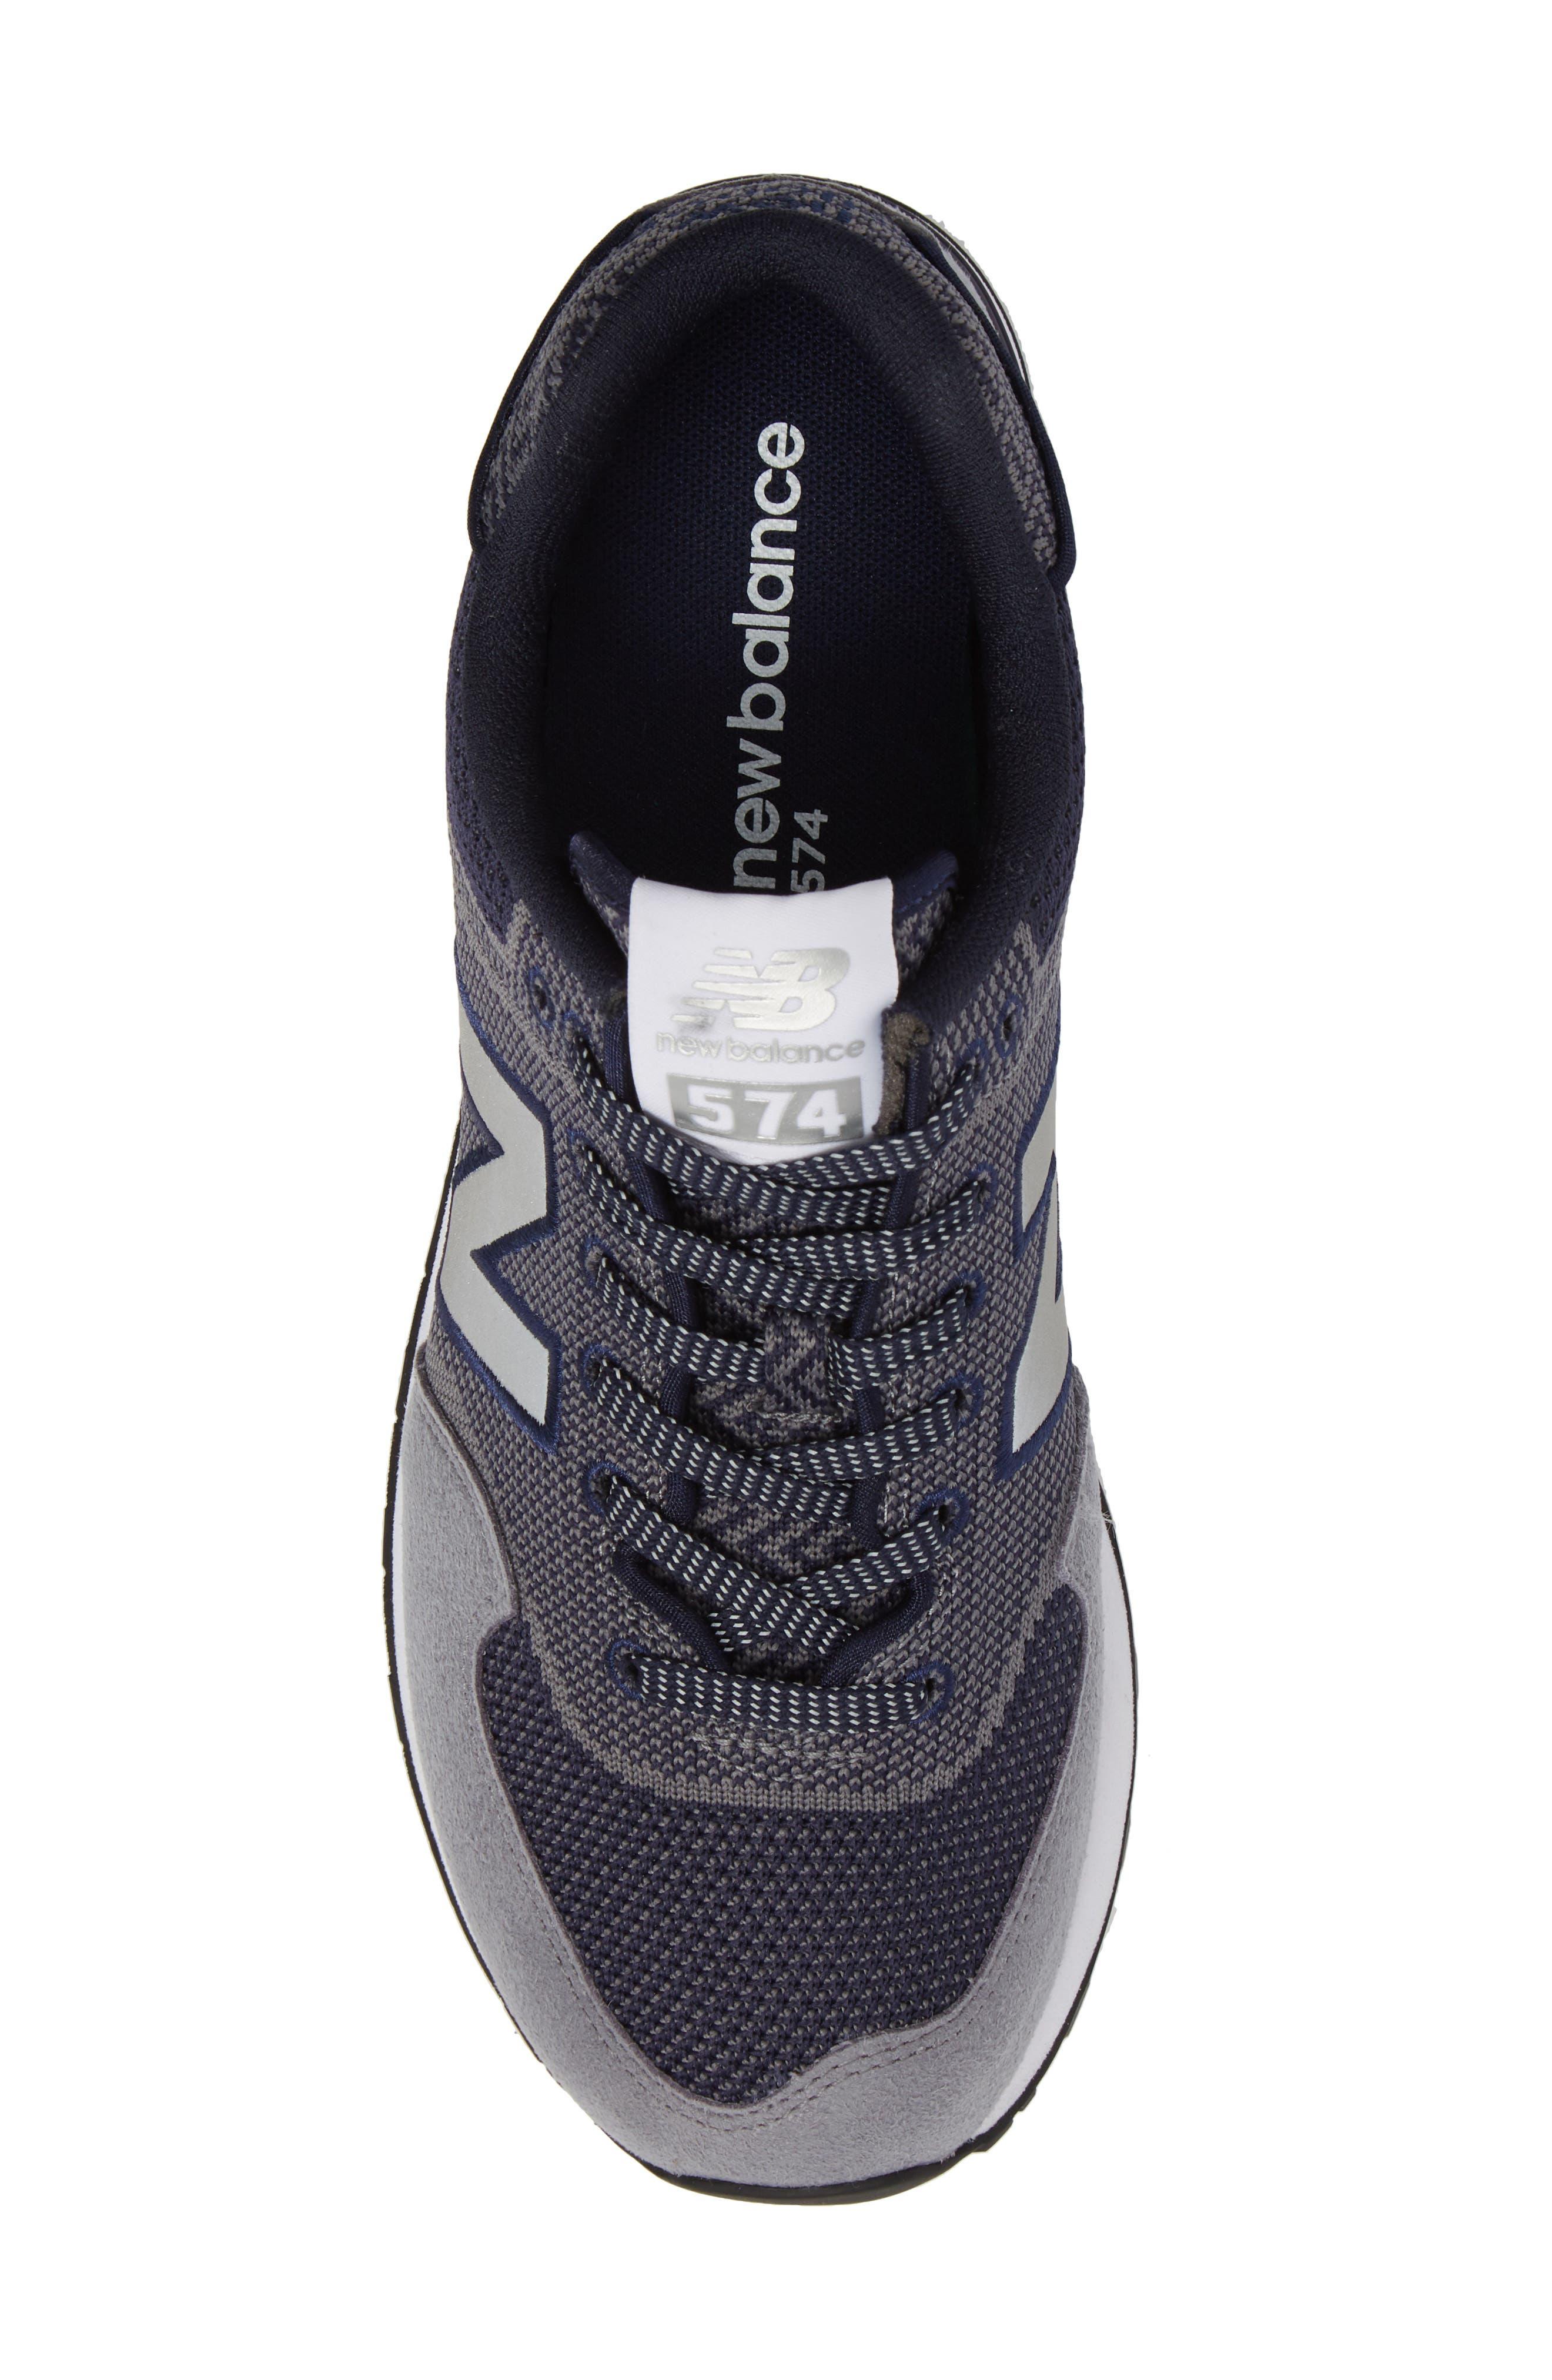 Engineered Mesh Sneaker,                             Alternate thumbnail 5, color,                             020